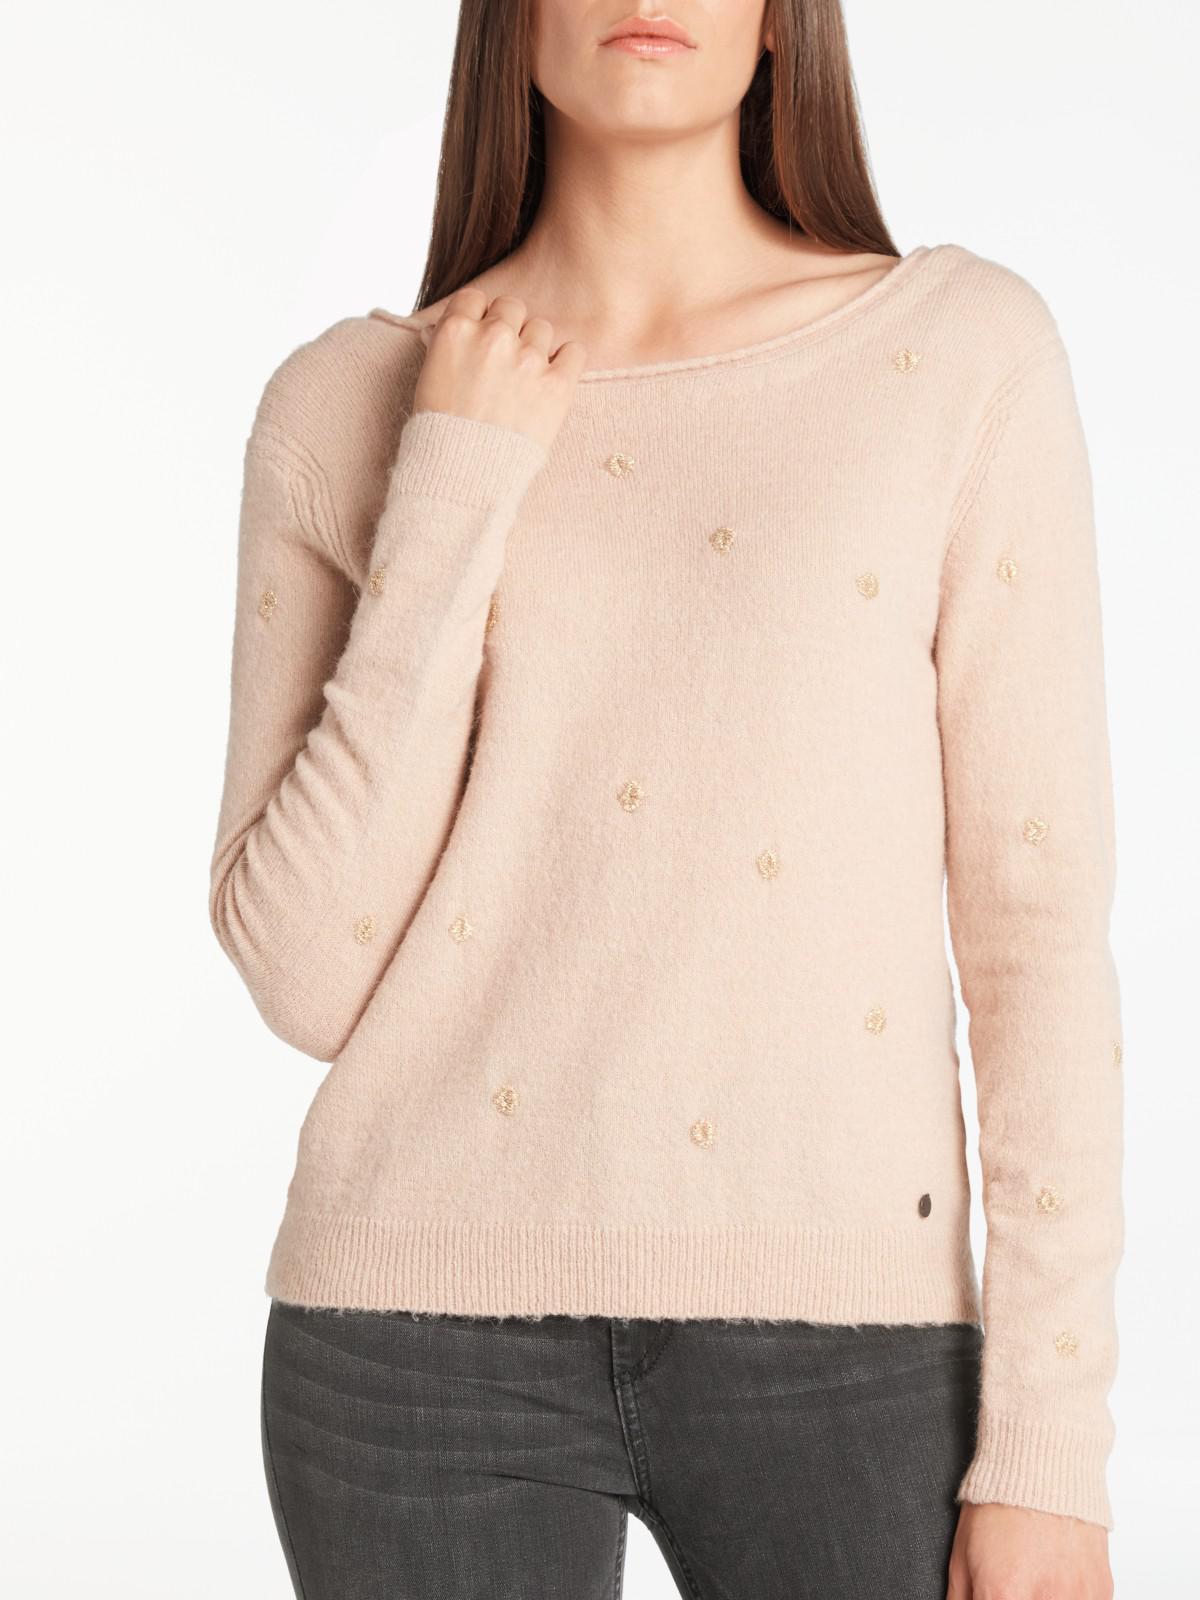 Collections Sale Online Shopping Online Clearance Numph Women's Nungo Knit Sweatshirt YYsrBukaur